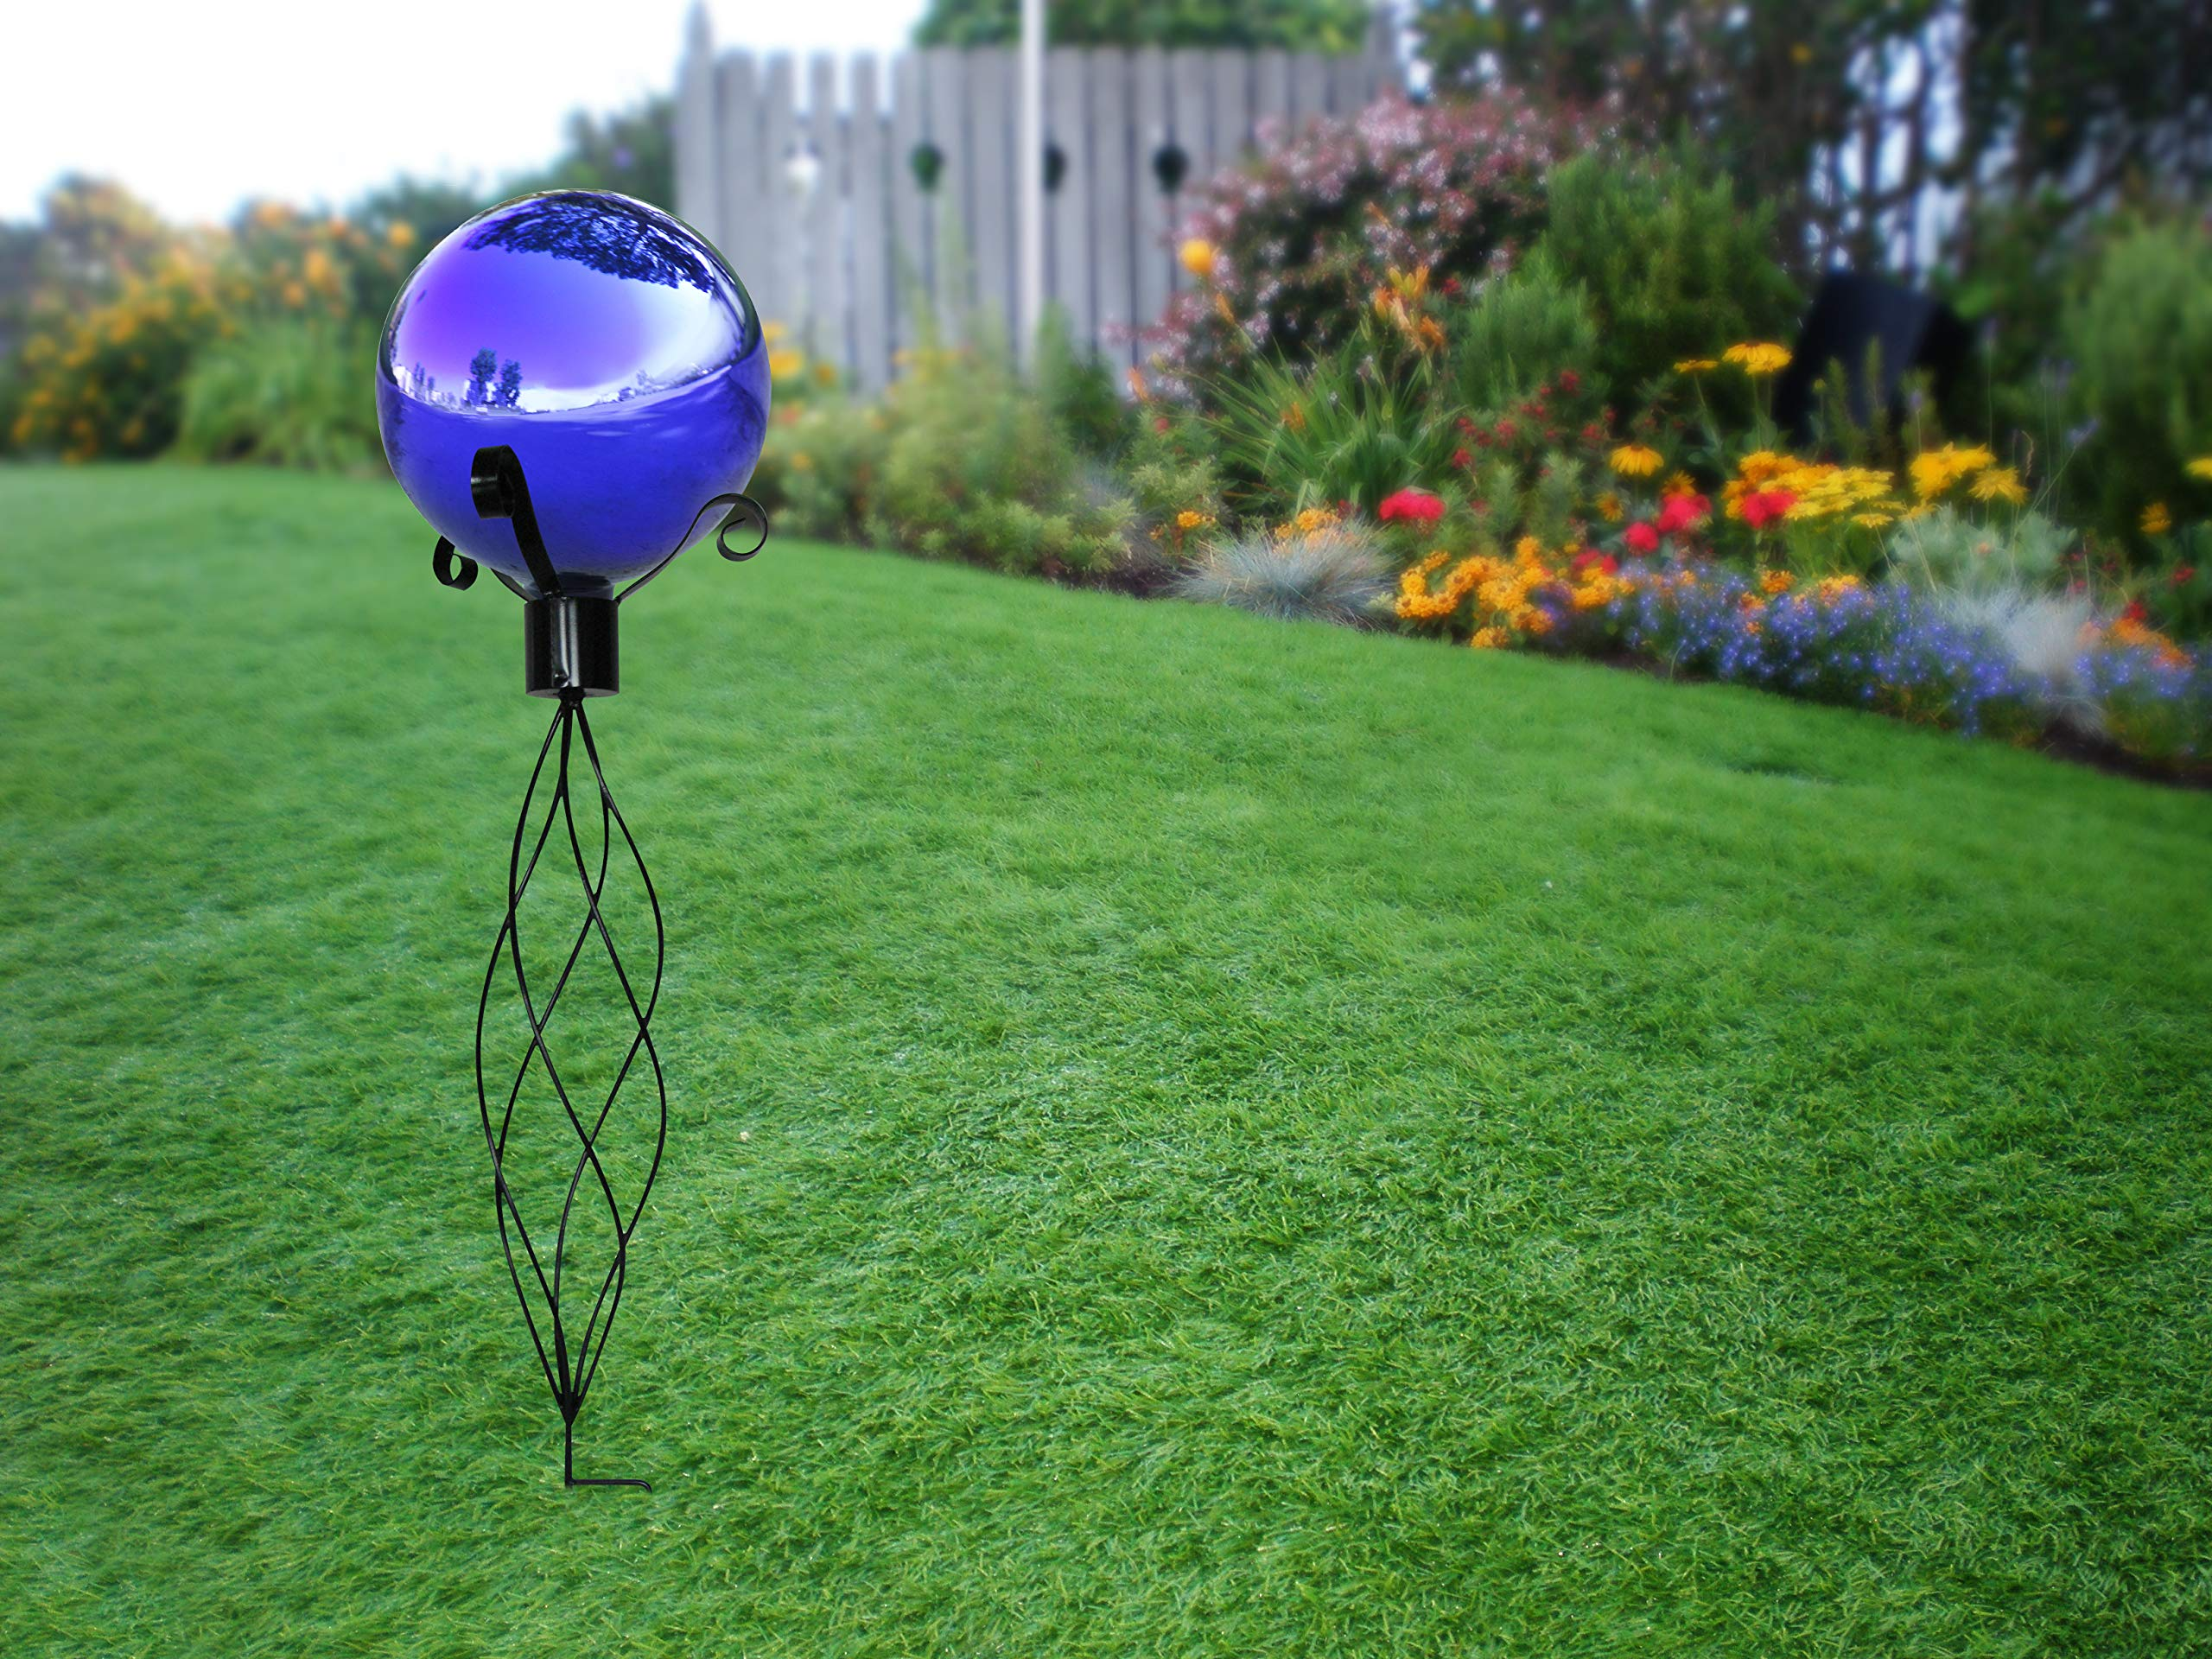 Alpine Corporation GLB292BL Glass Gazing Globe Outdoor Festive Holiday Décor for Garden, Lawn, Yard, 12-Inch Tall, Blue